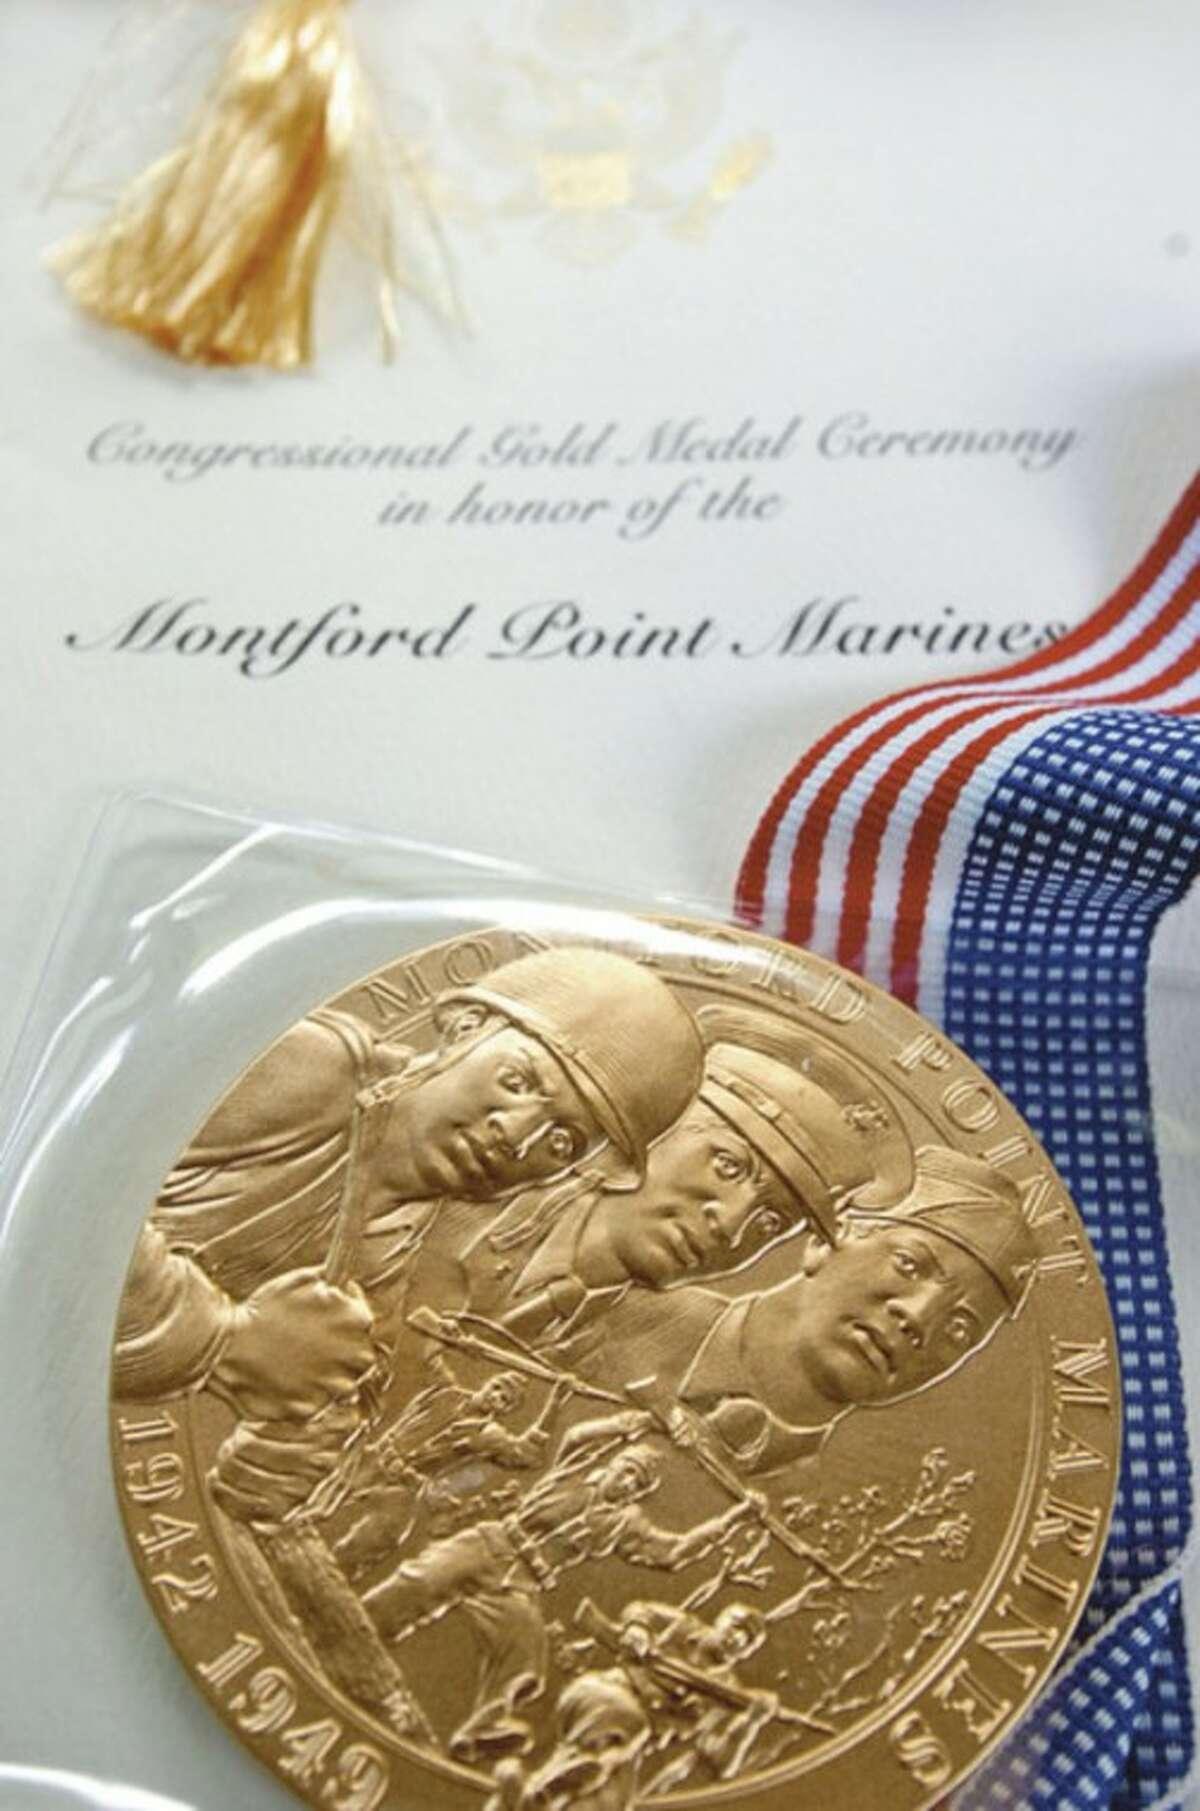 Congress last week awarded Isaac Ballard the Congressional Gold Medal.